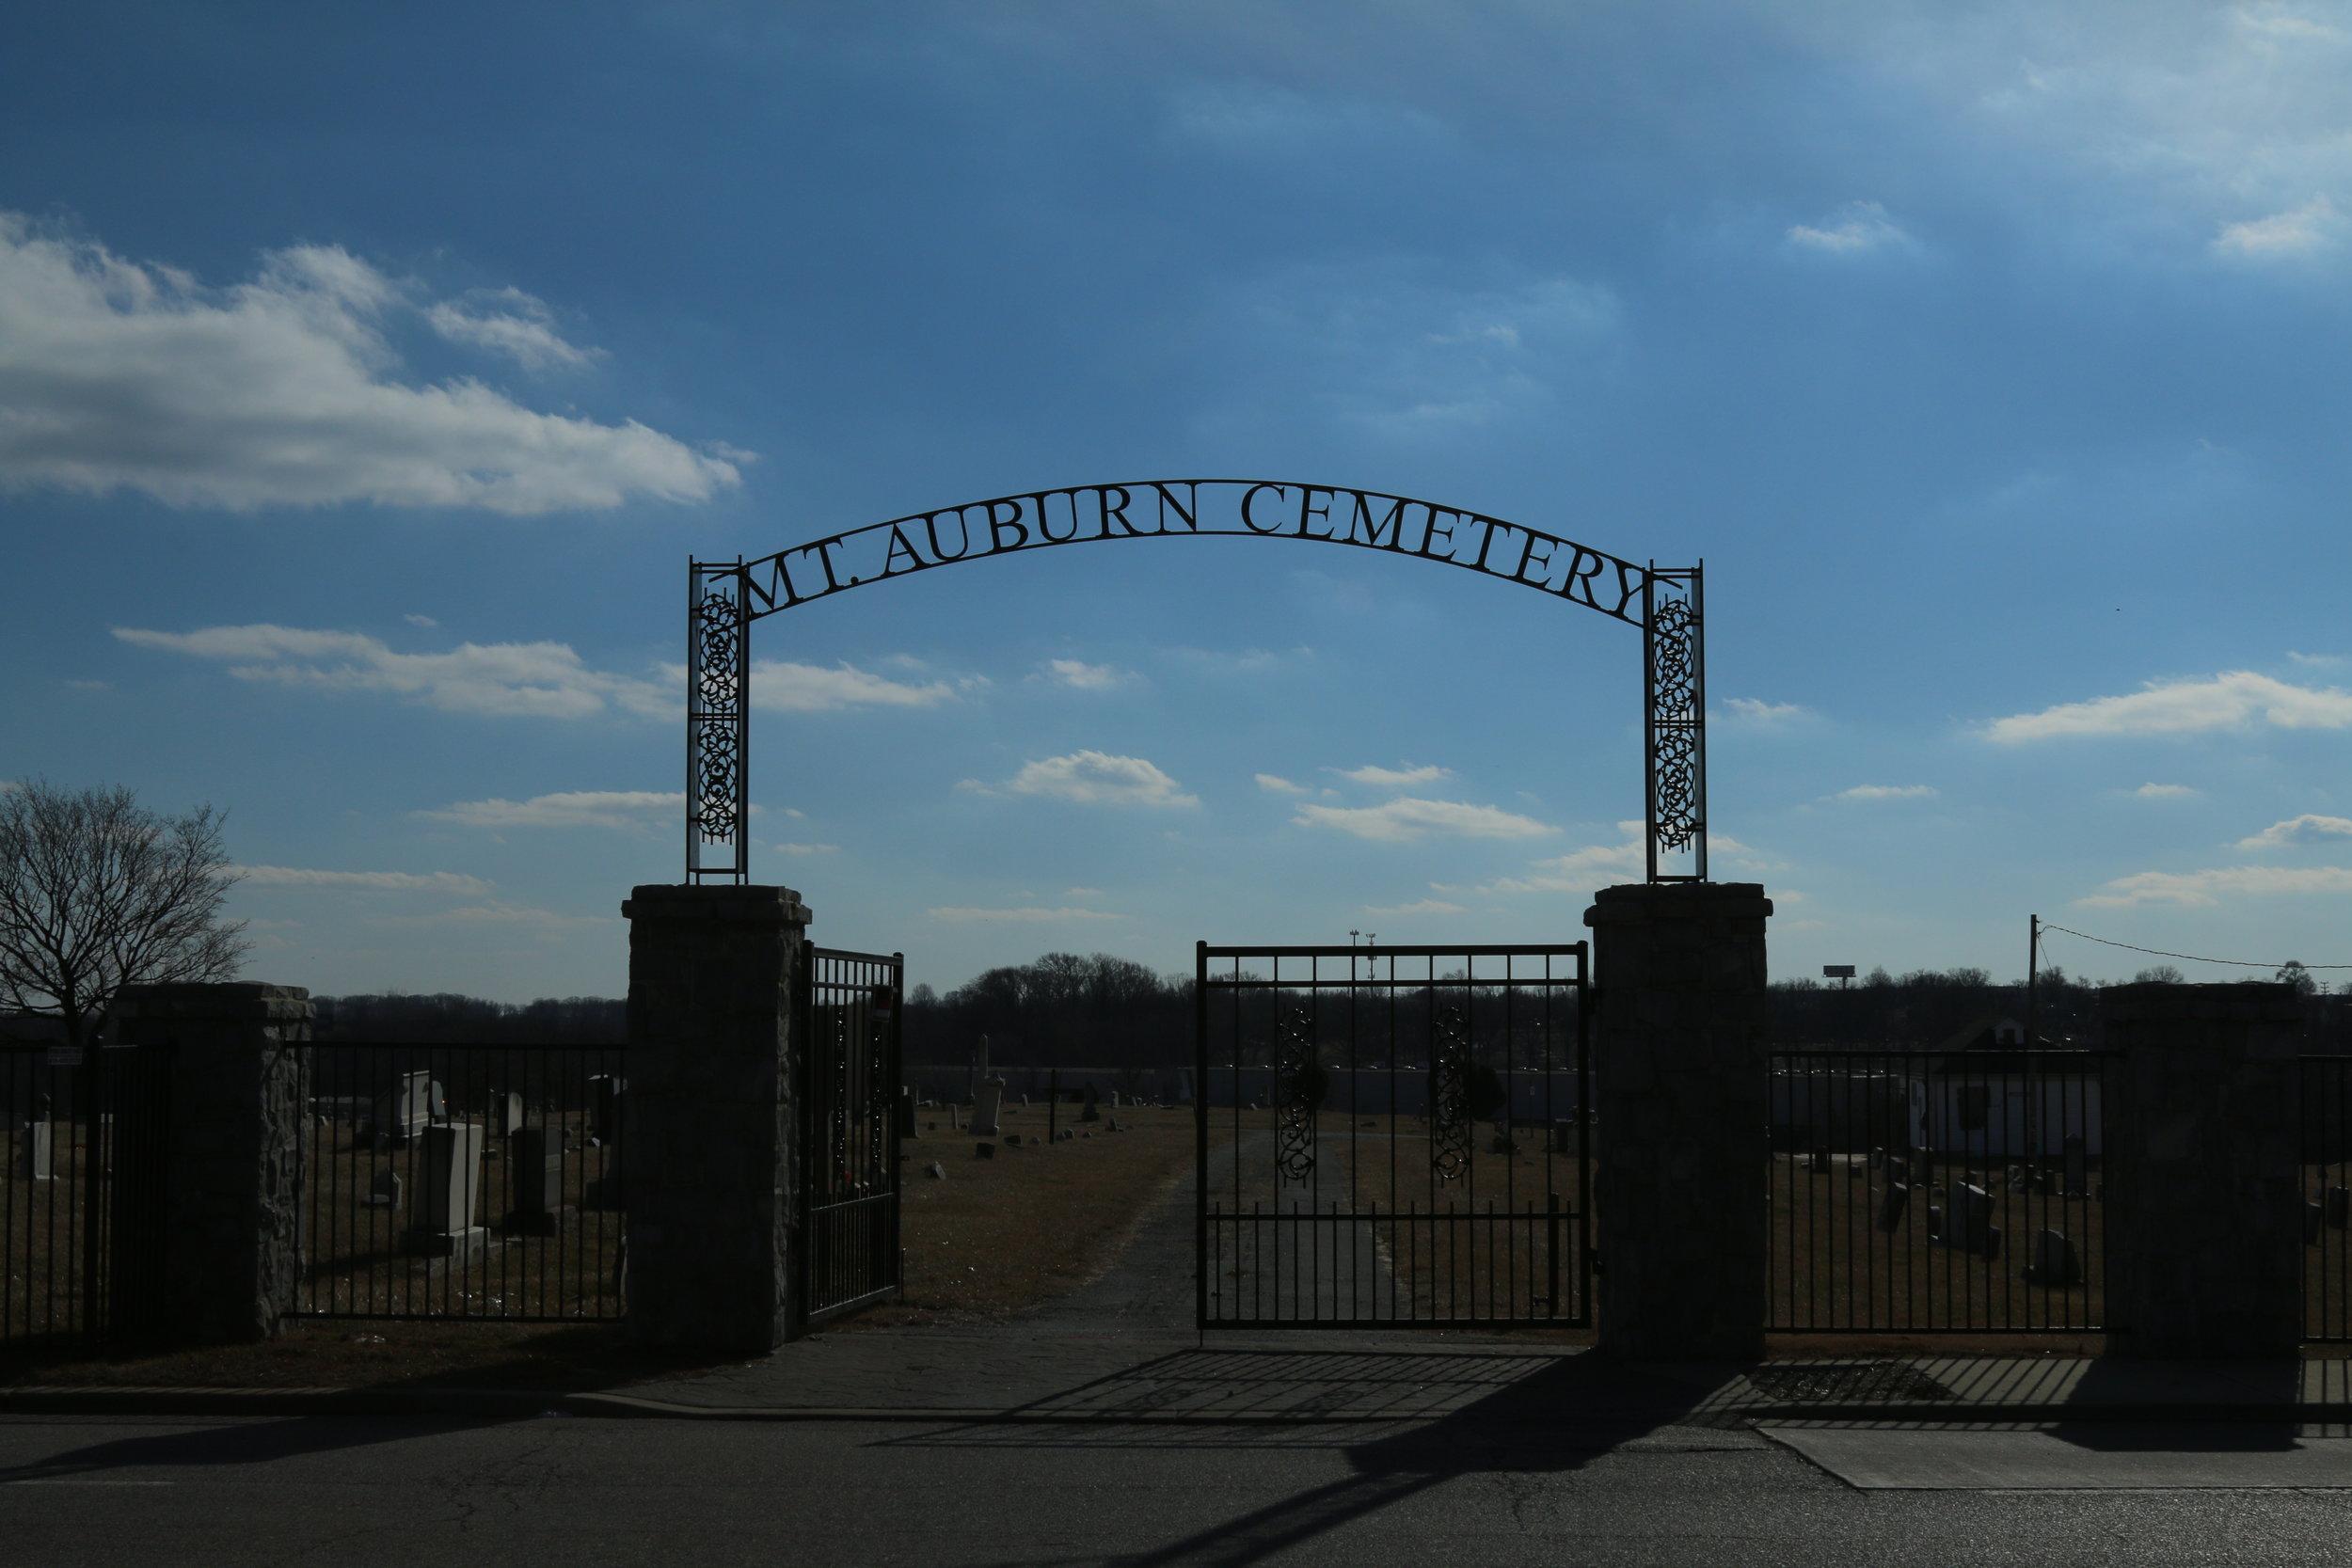 Baltimore's Mt. Auburn Cemetery